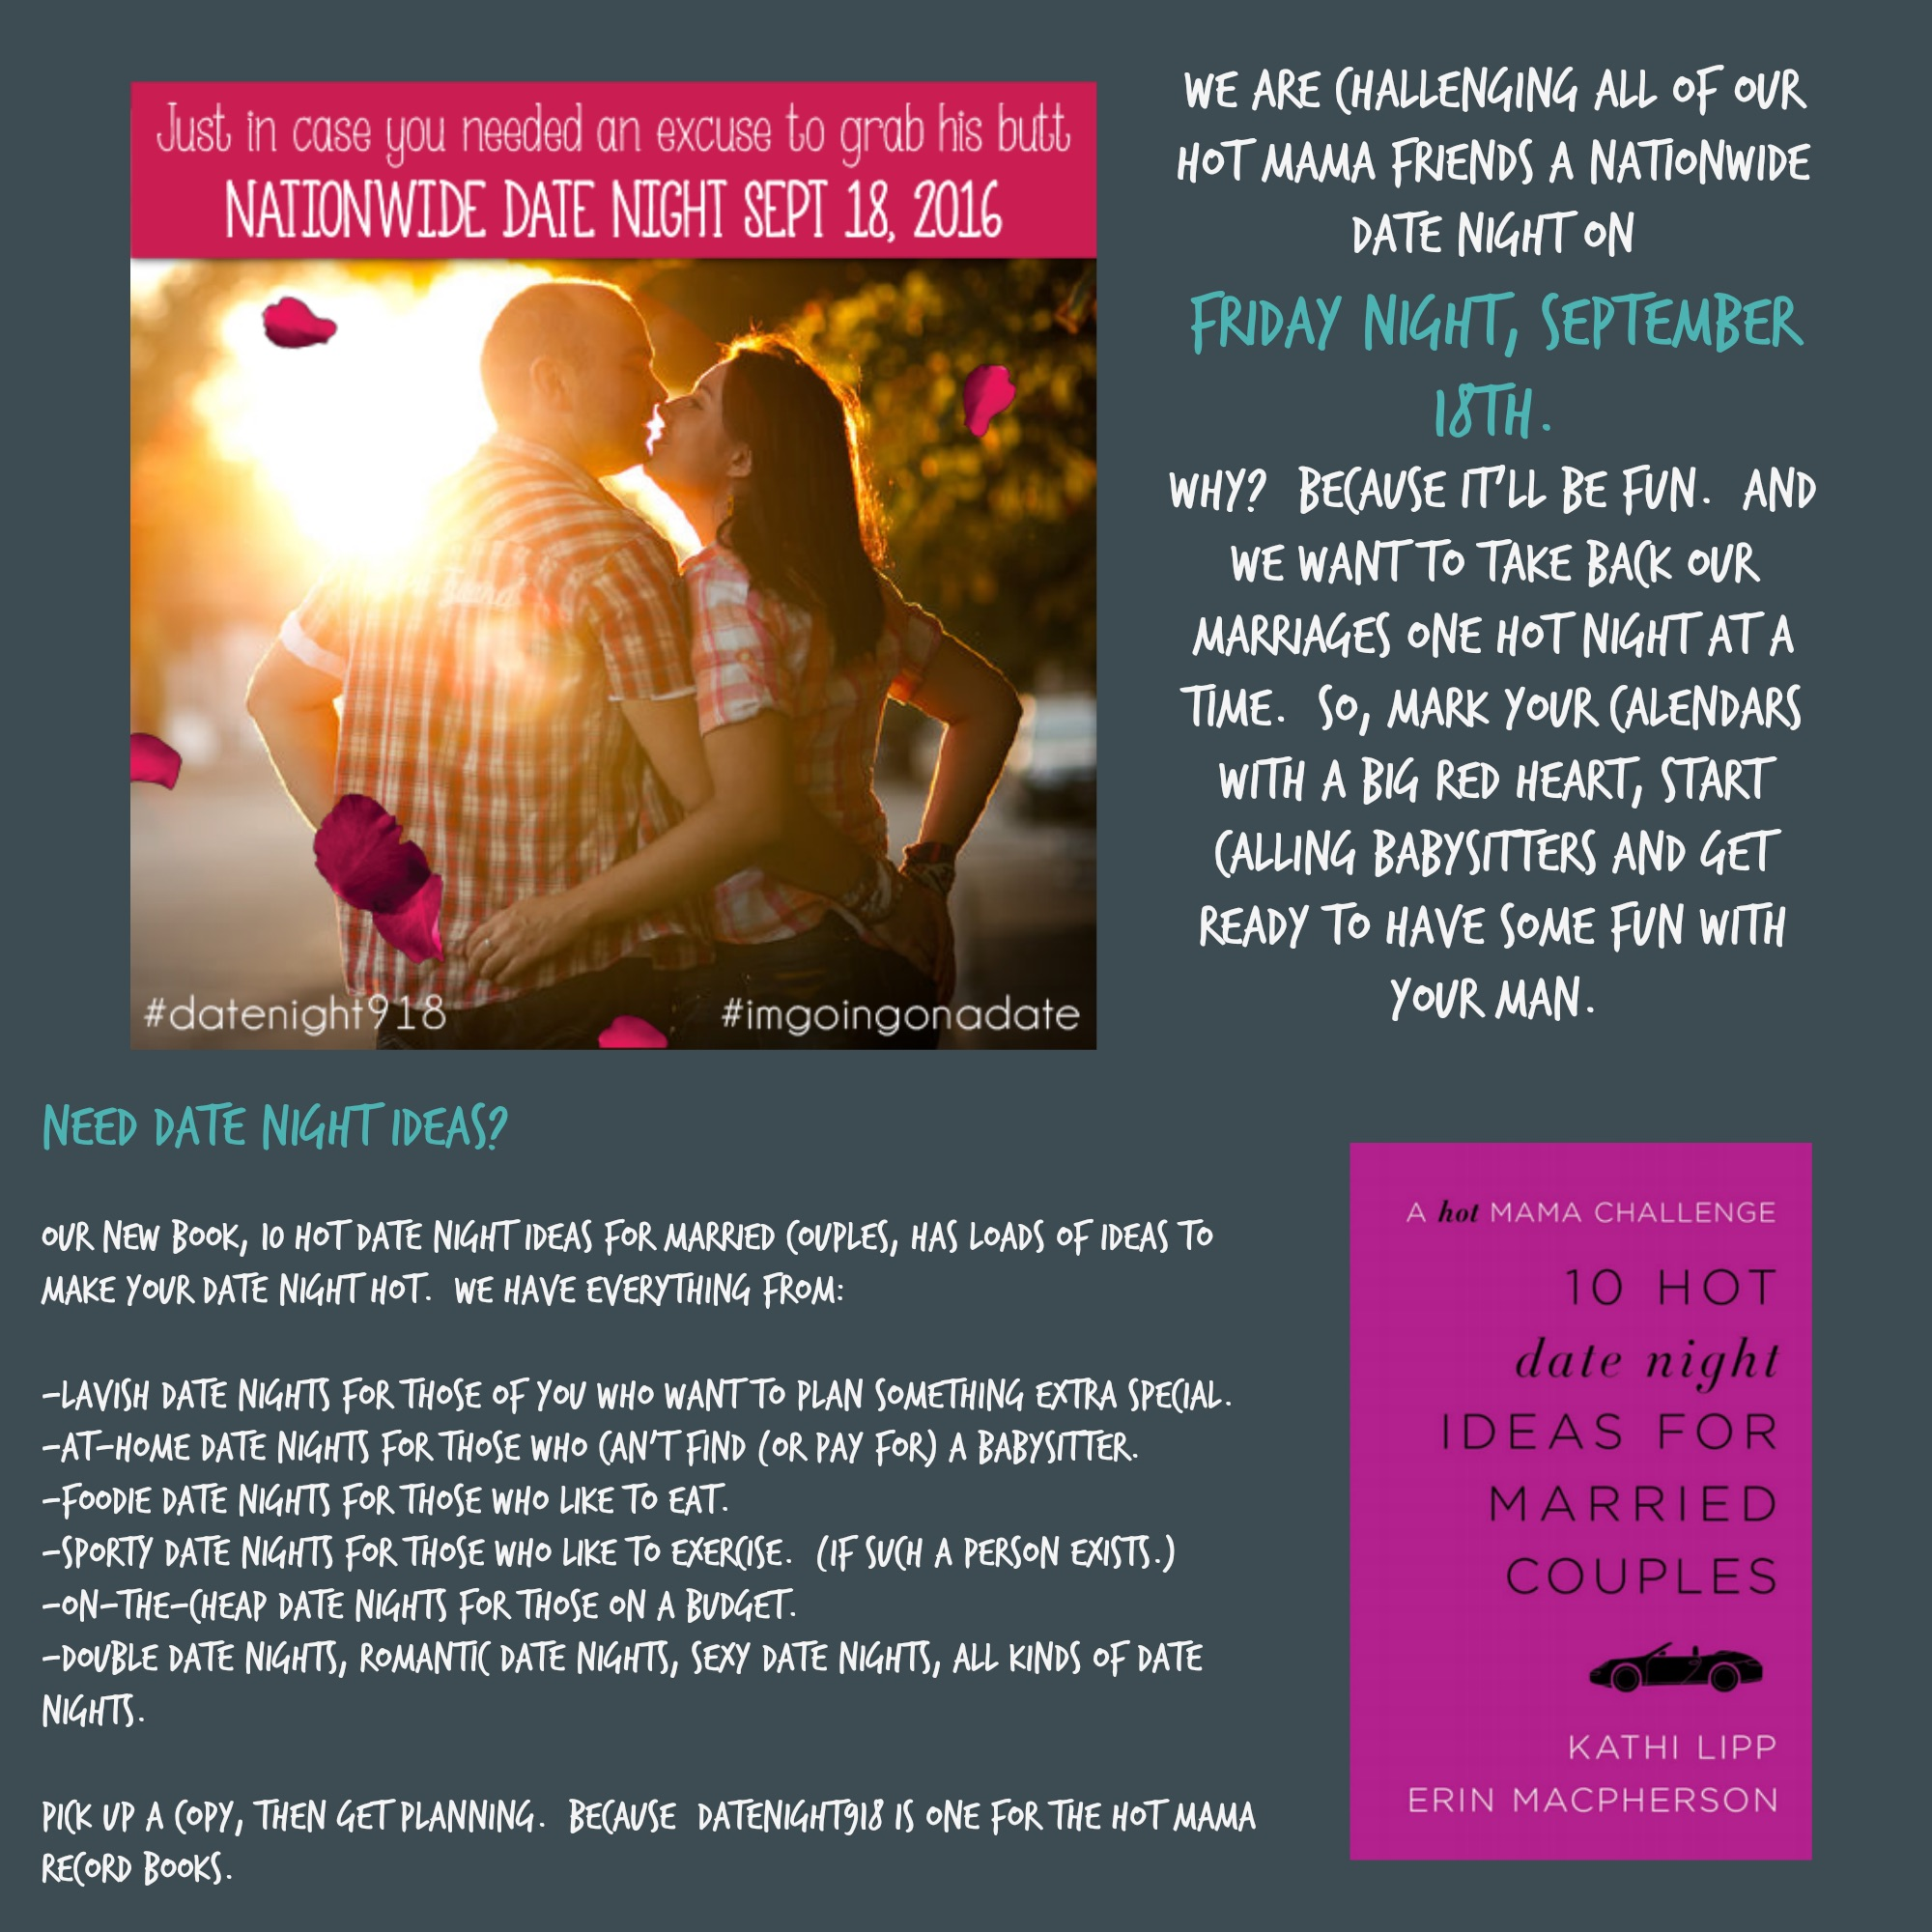 http://www.amazon.com/Hot-Mama-Secrets-Sizzling-Marriage-ebook/dp/B00XNPCICM/ref=as_li_ss_tl?s=digital-text&ie=UTF8&qid=1439051426&sr=1-7&keywords=hot+mama&linkCode=sl1&tag=chrmamsgui-20&linkId=590ae33b2200fac1ab8aec13f588396c